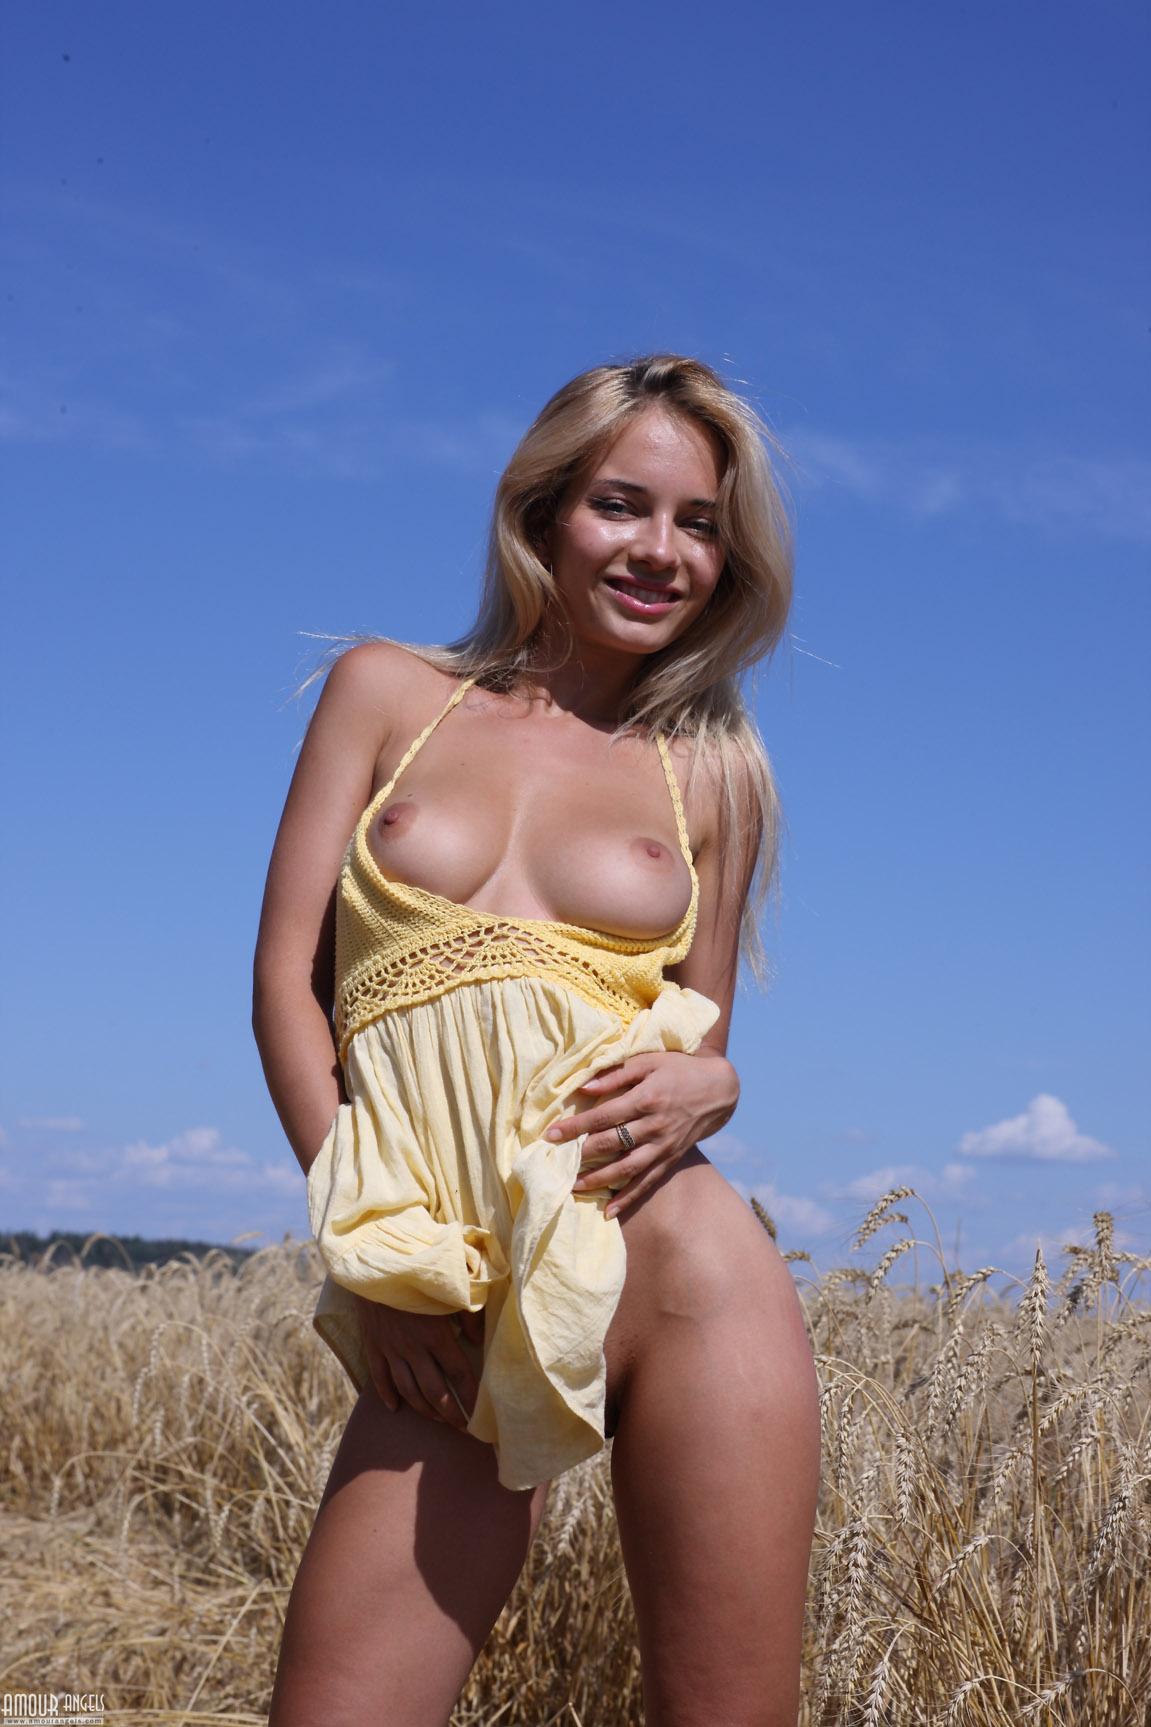 Наталья Андреева в пшеничном поле / Natalya Andreeva aka Asya nude by Peter Chupurov